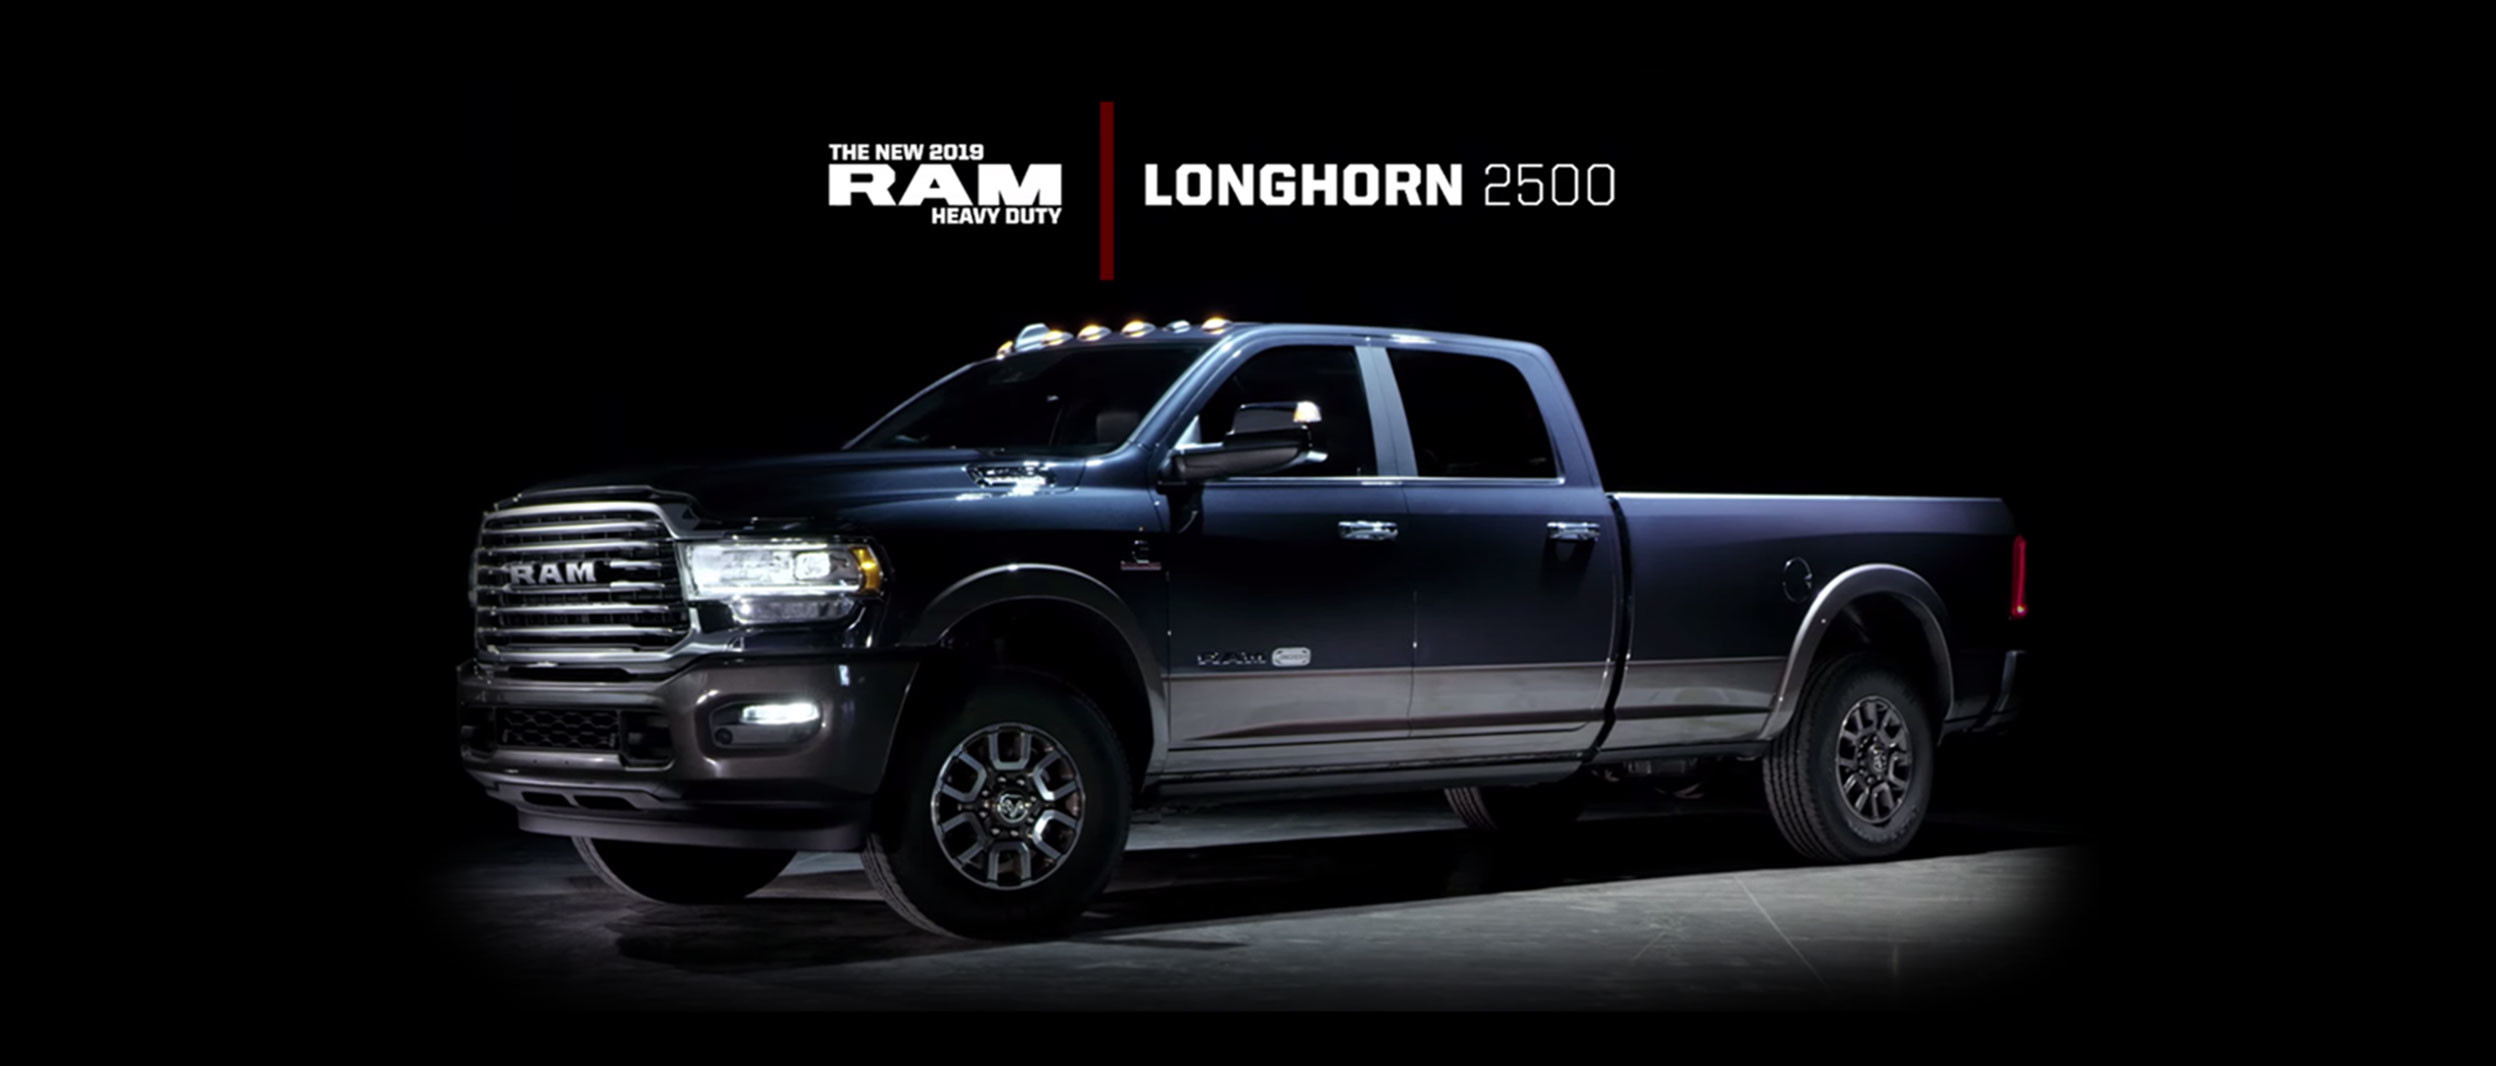 New 2019 Ram 2500 Heavy Duty Truck | Ram Trucks Canada